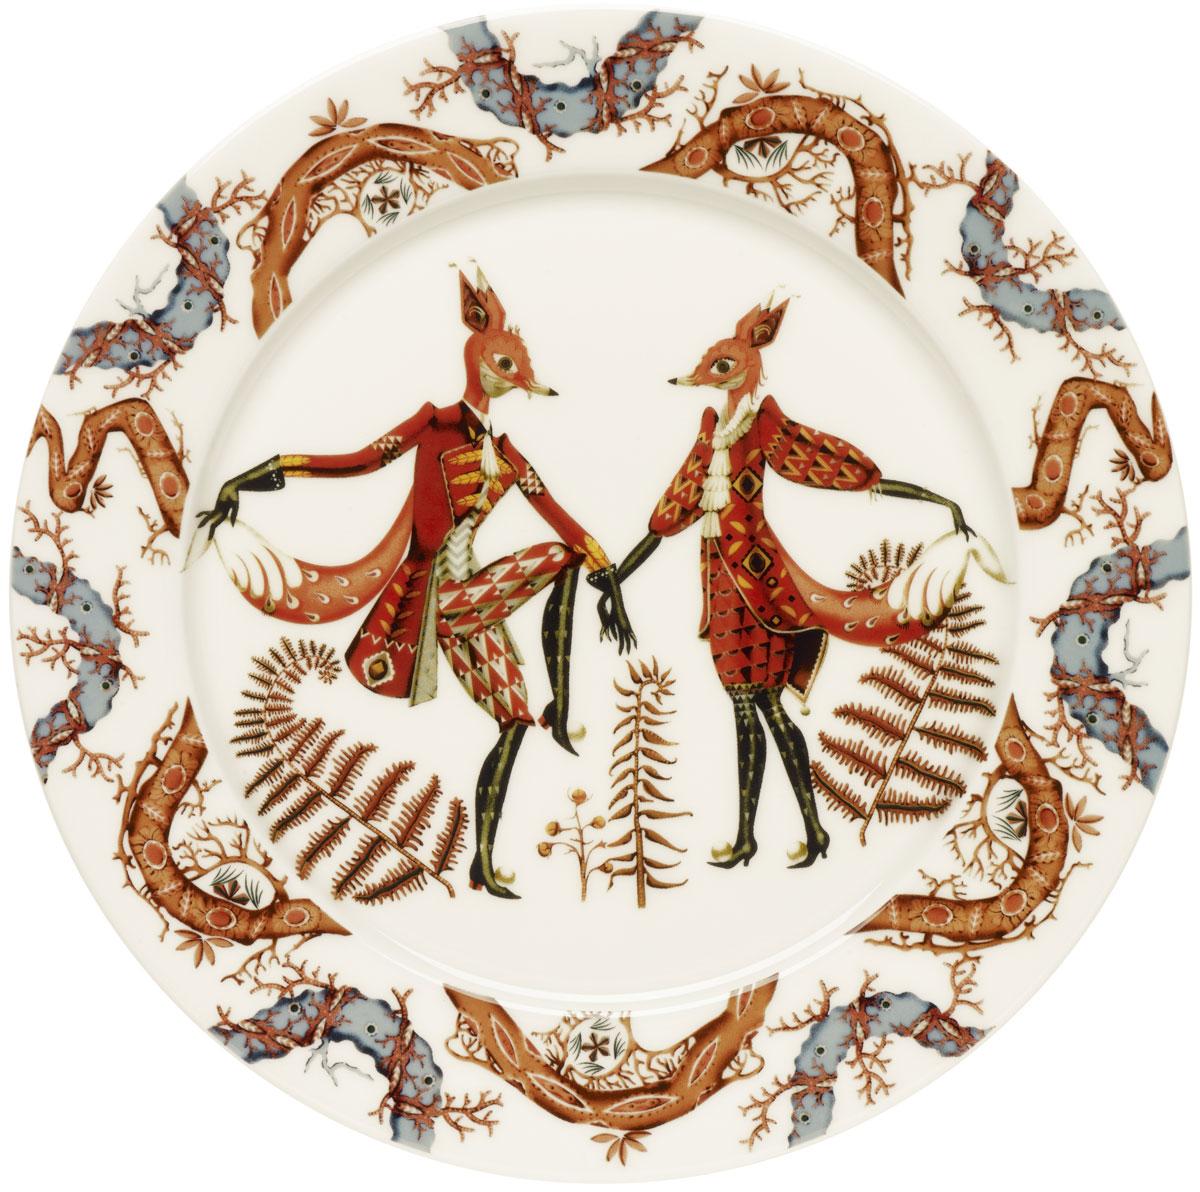 Тарелка Iittala Tanssi, диаметр 27 см iittala тарелка taika